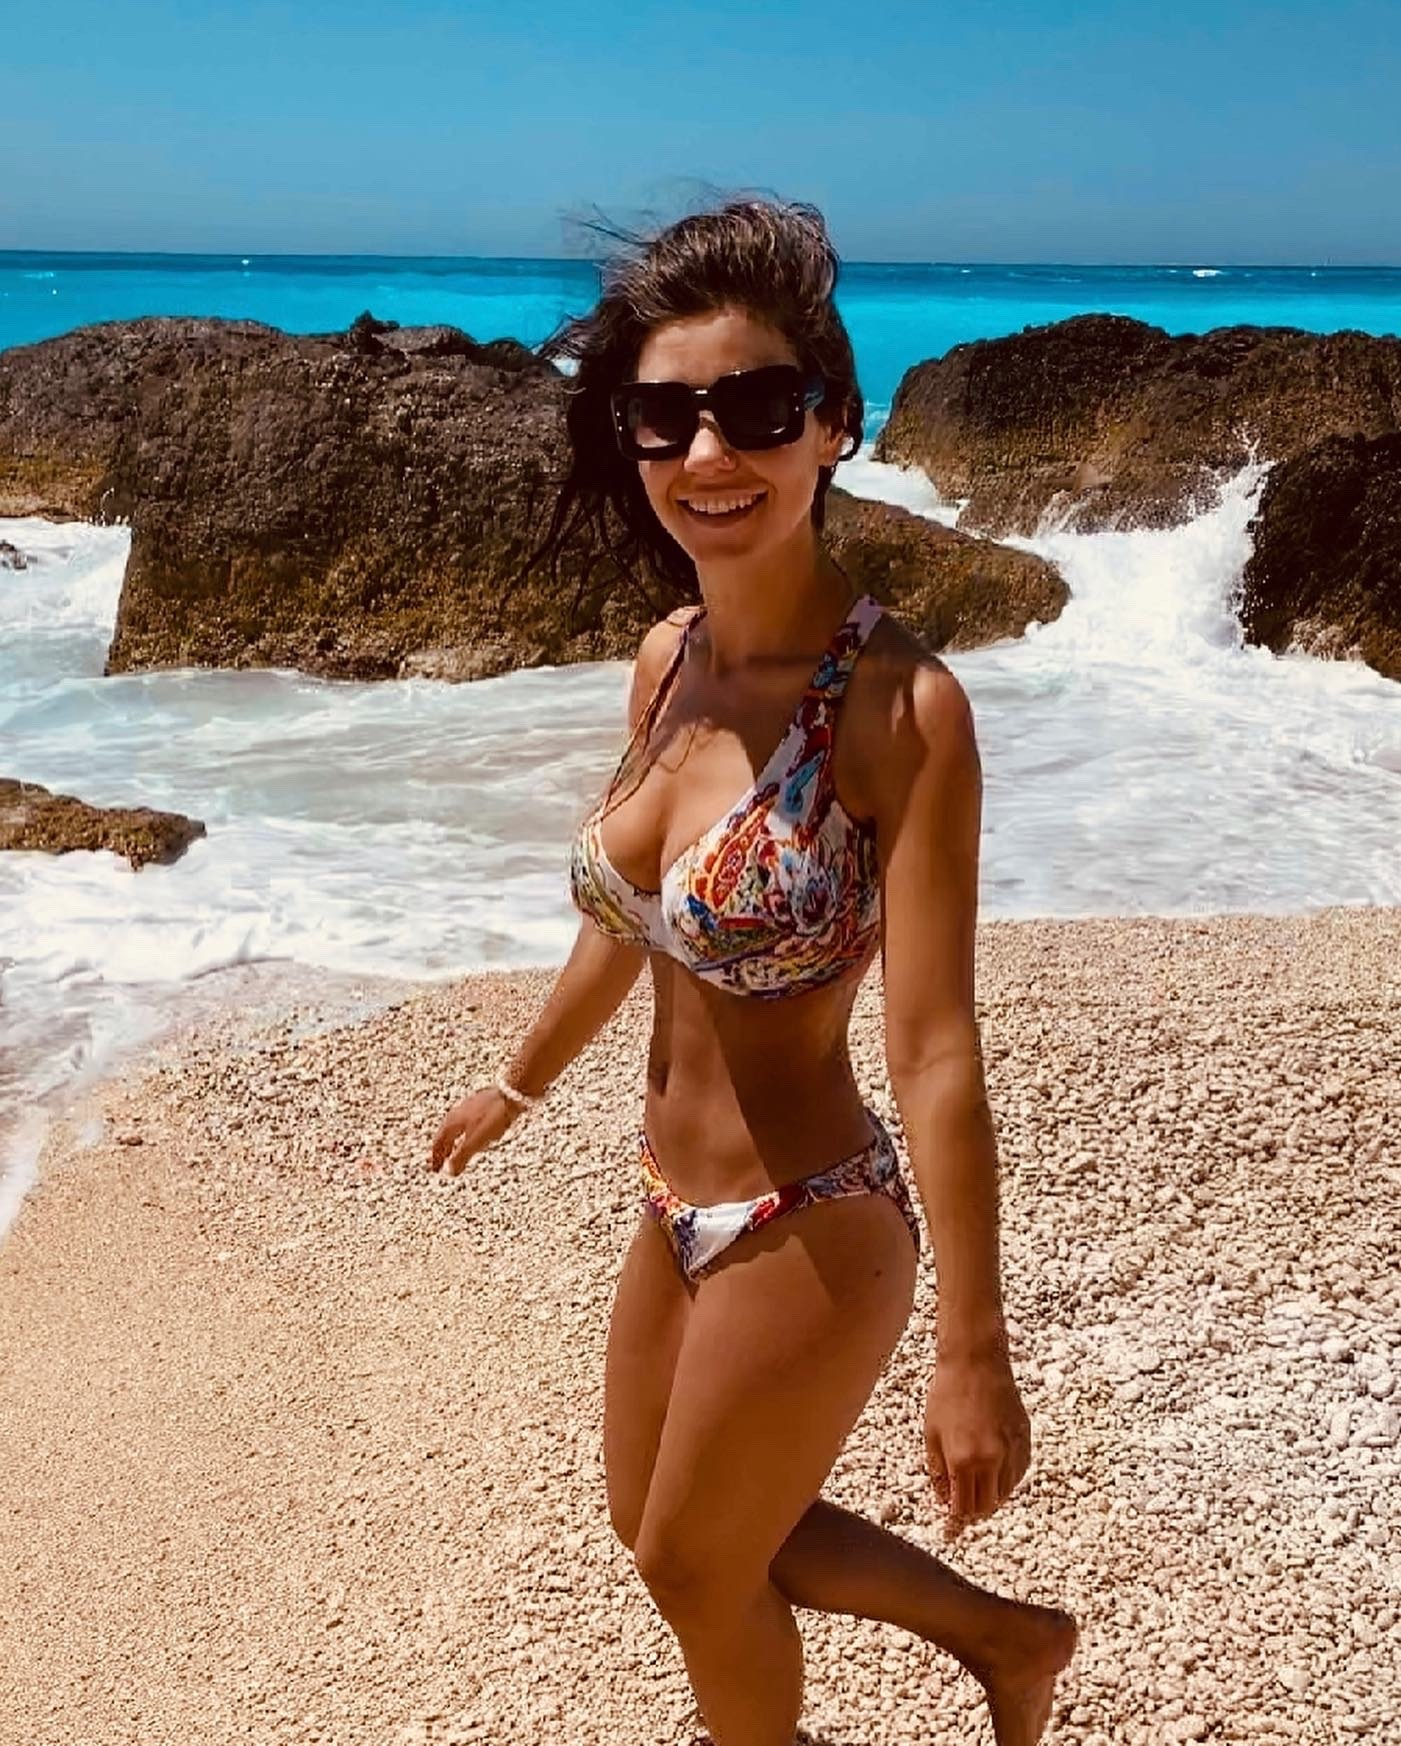 Marina Lambrini Diamandis's Feet